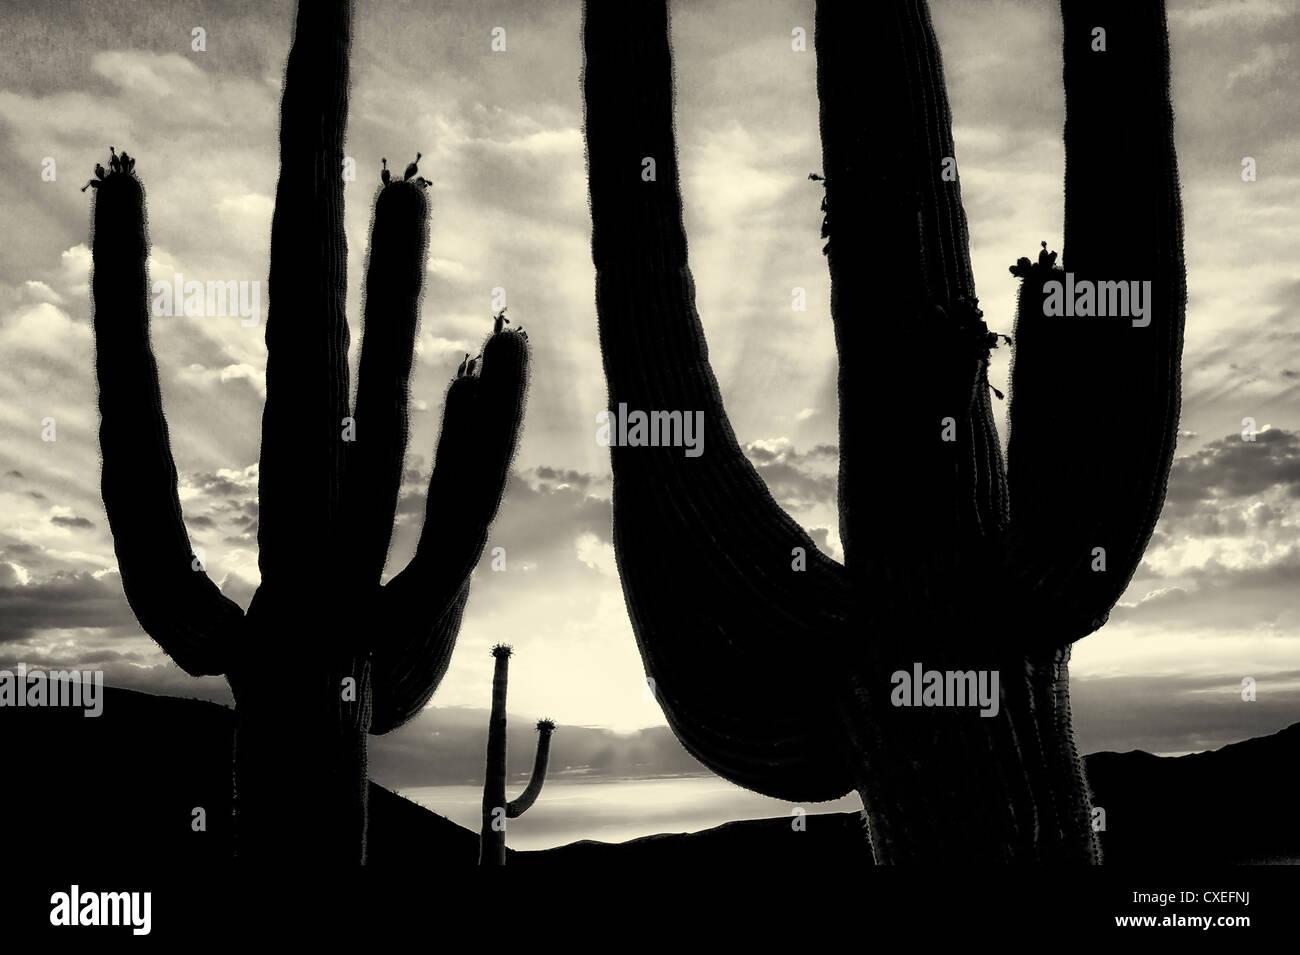 Silhouette Saguaro-Kaktus. Sonora-Wüste, Arizona. Stockbild